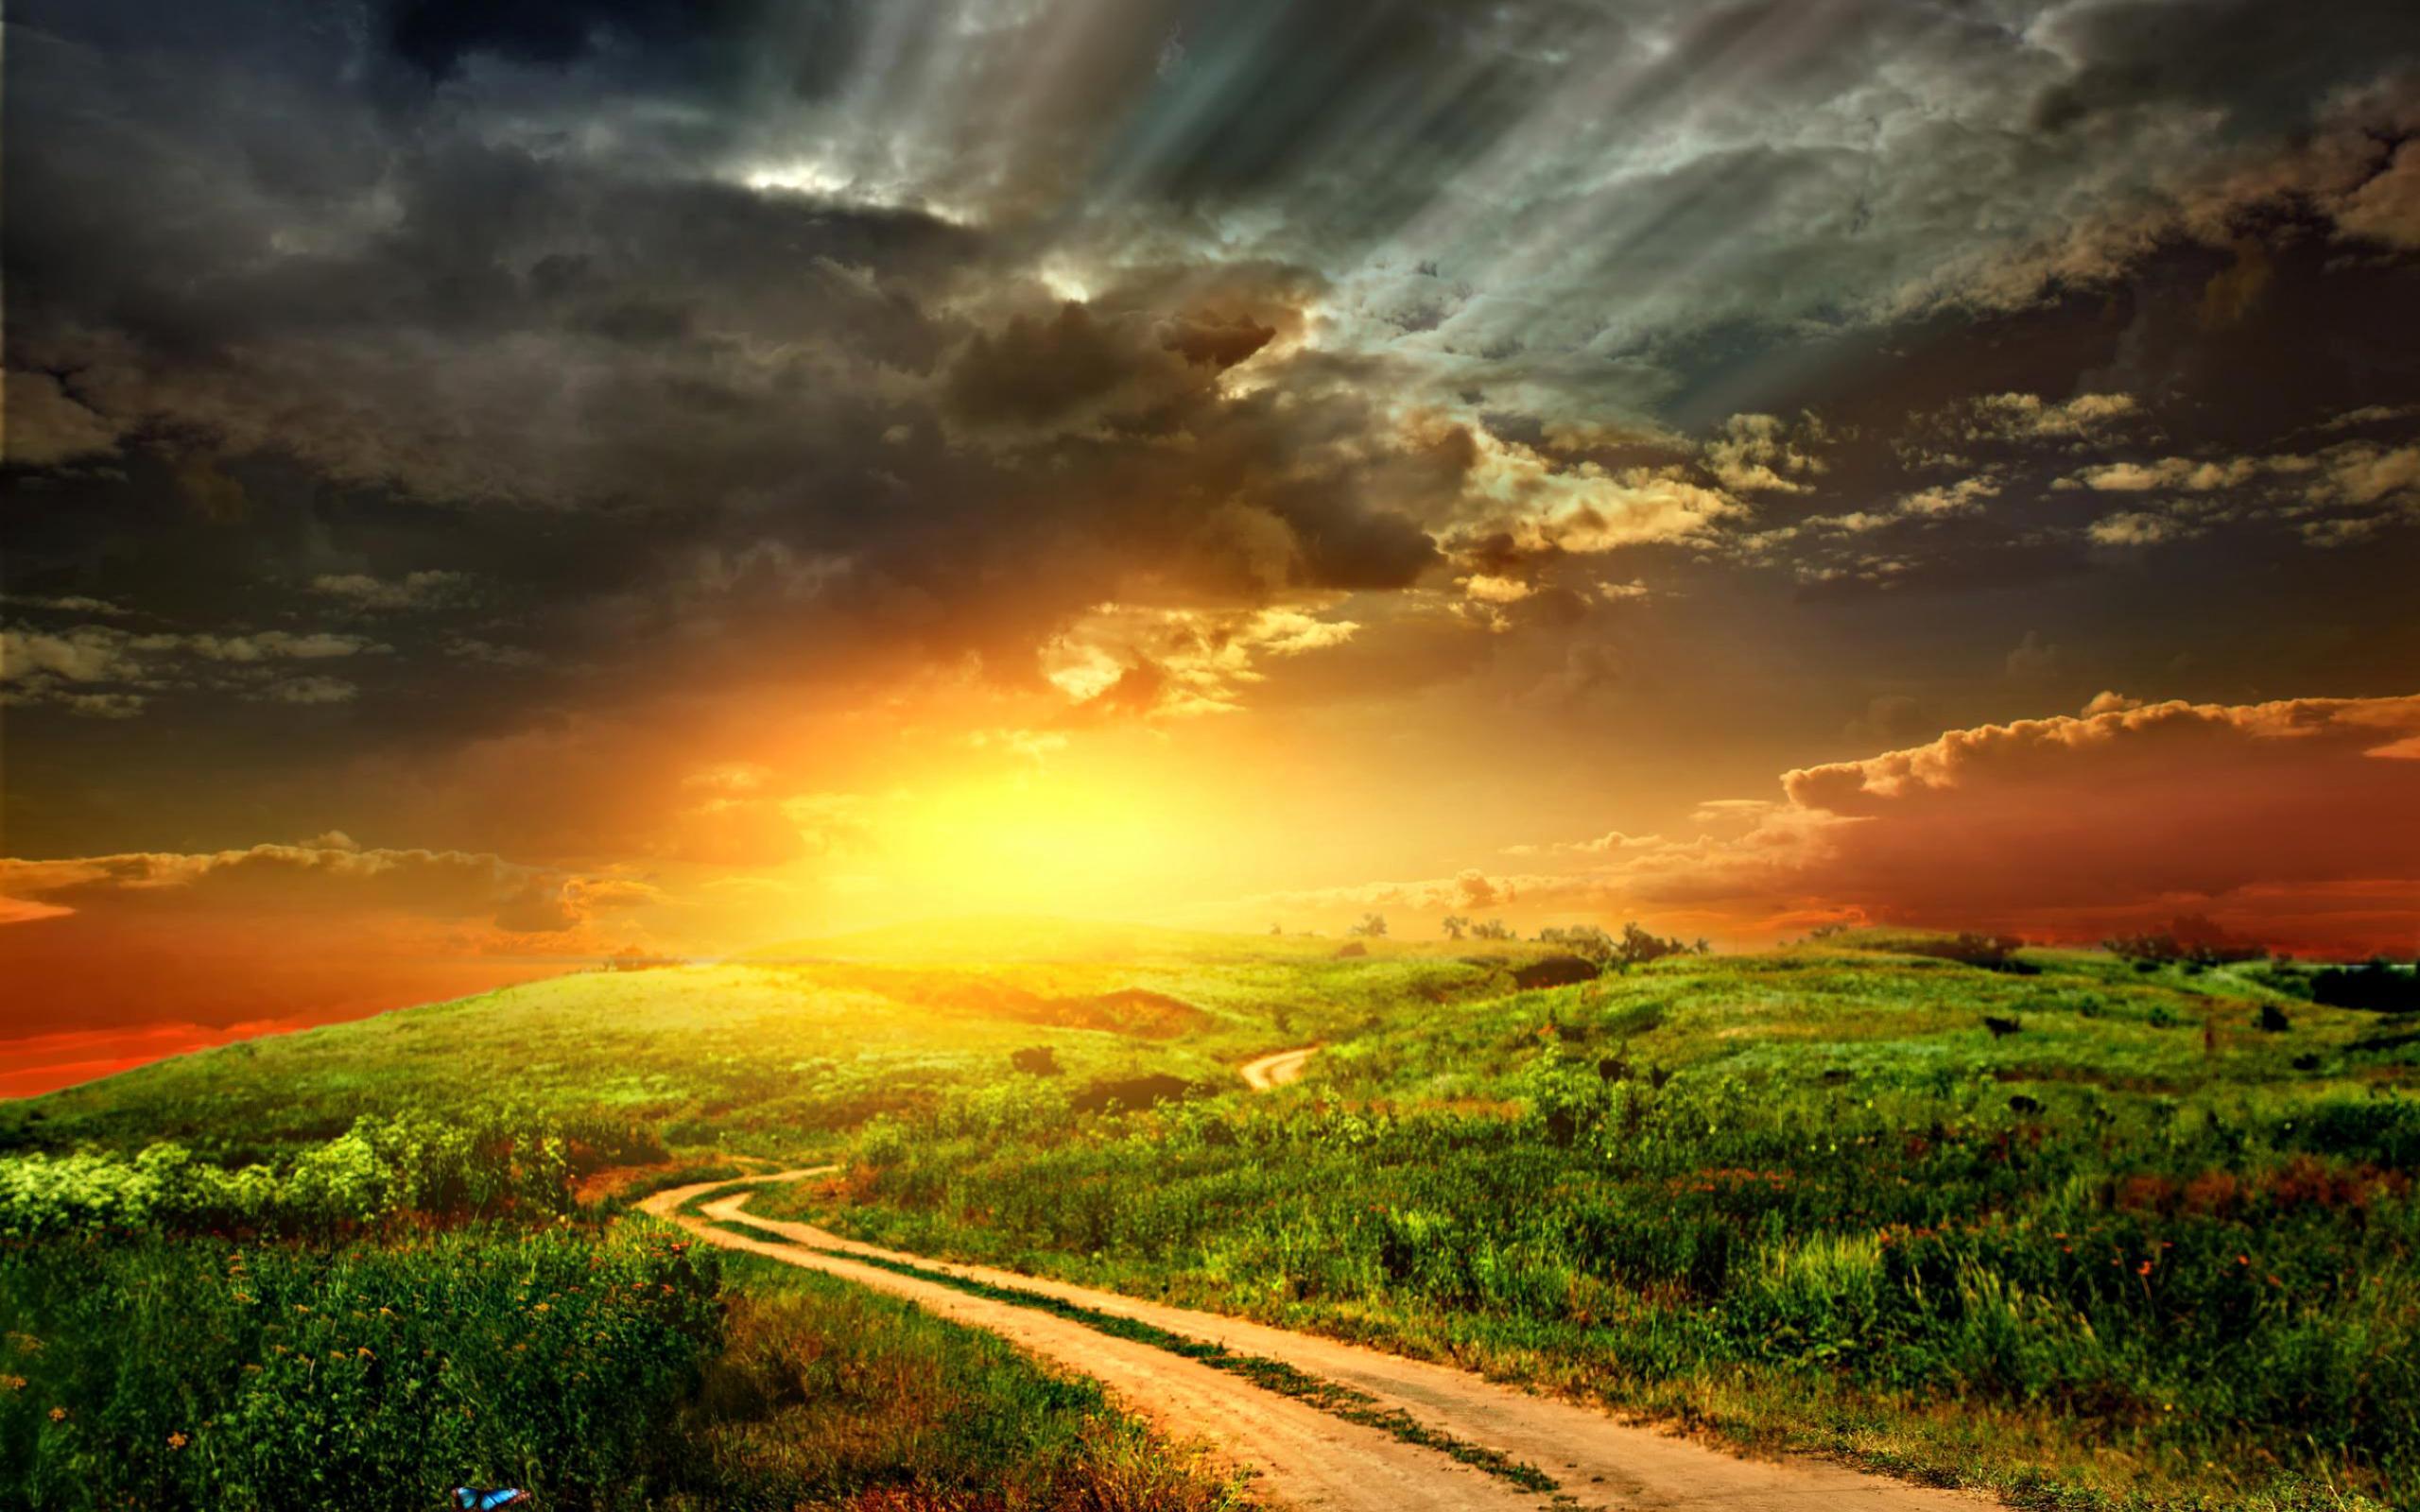 sunset-972934